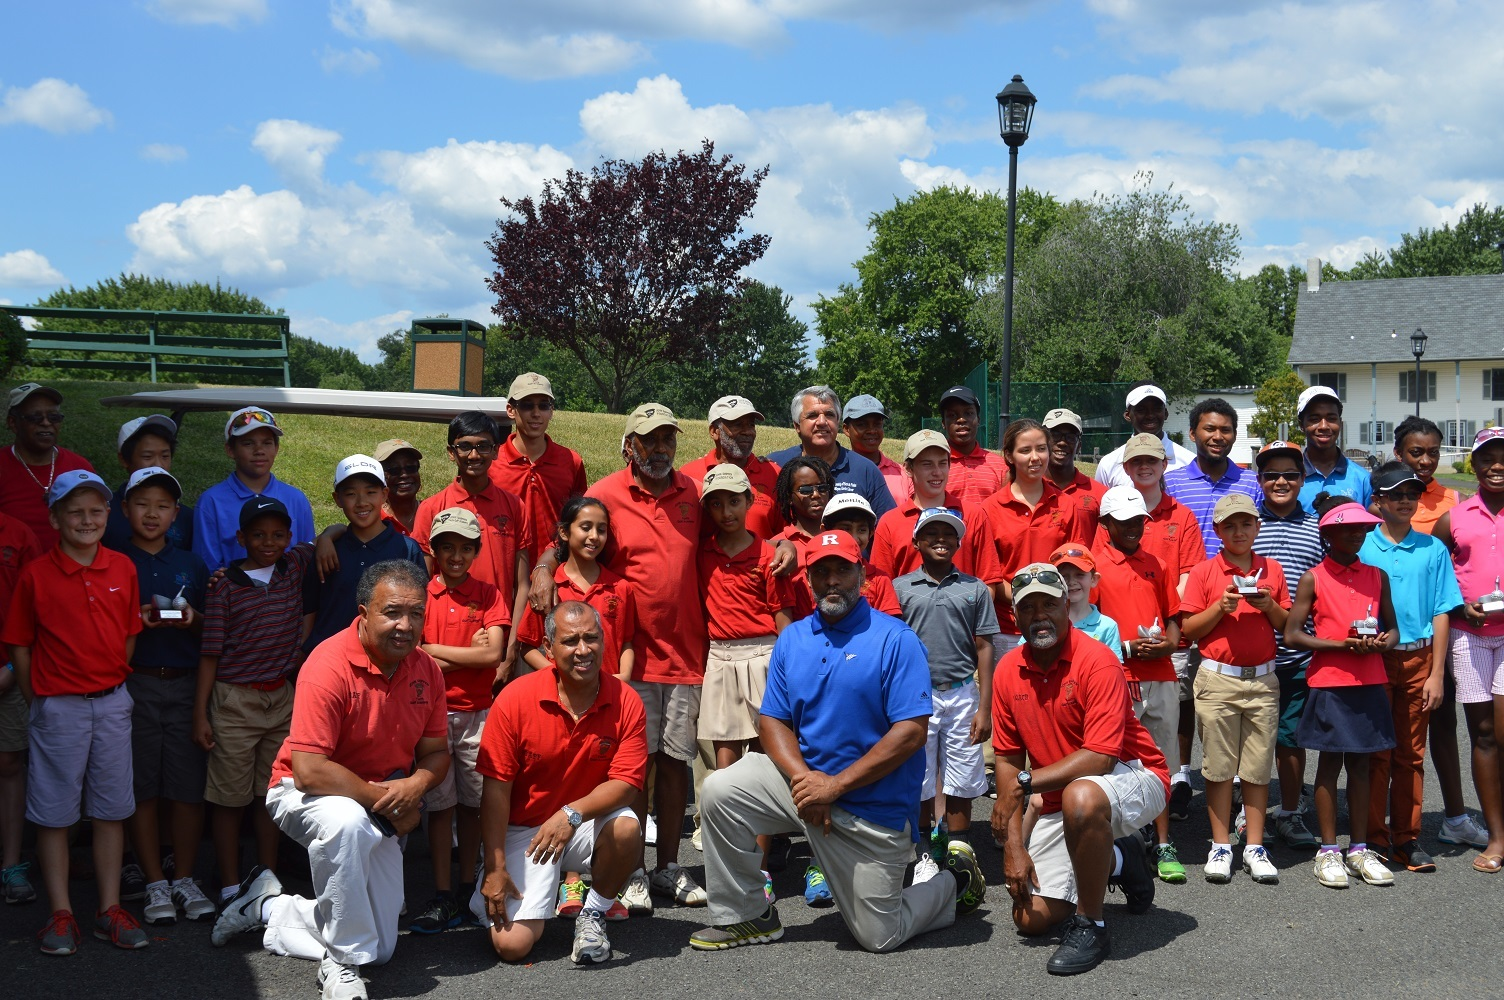 24bbc158322ea1e46d3c_Shippen_Golf_Tournament.JPG